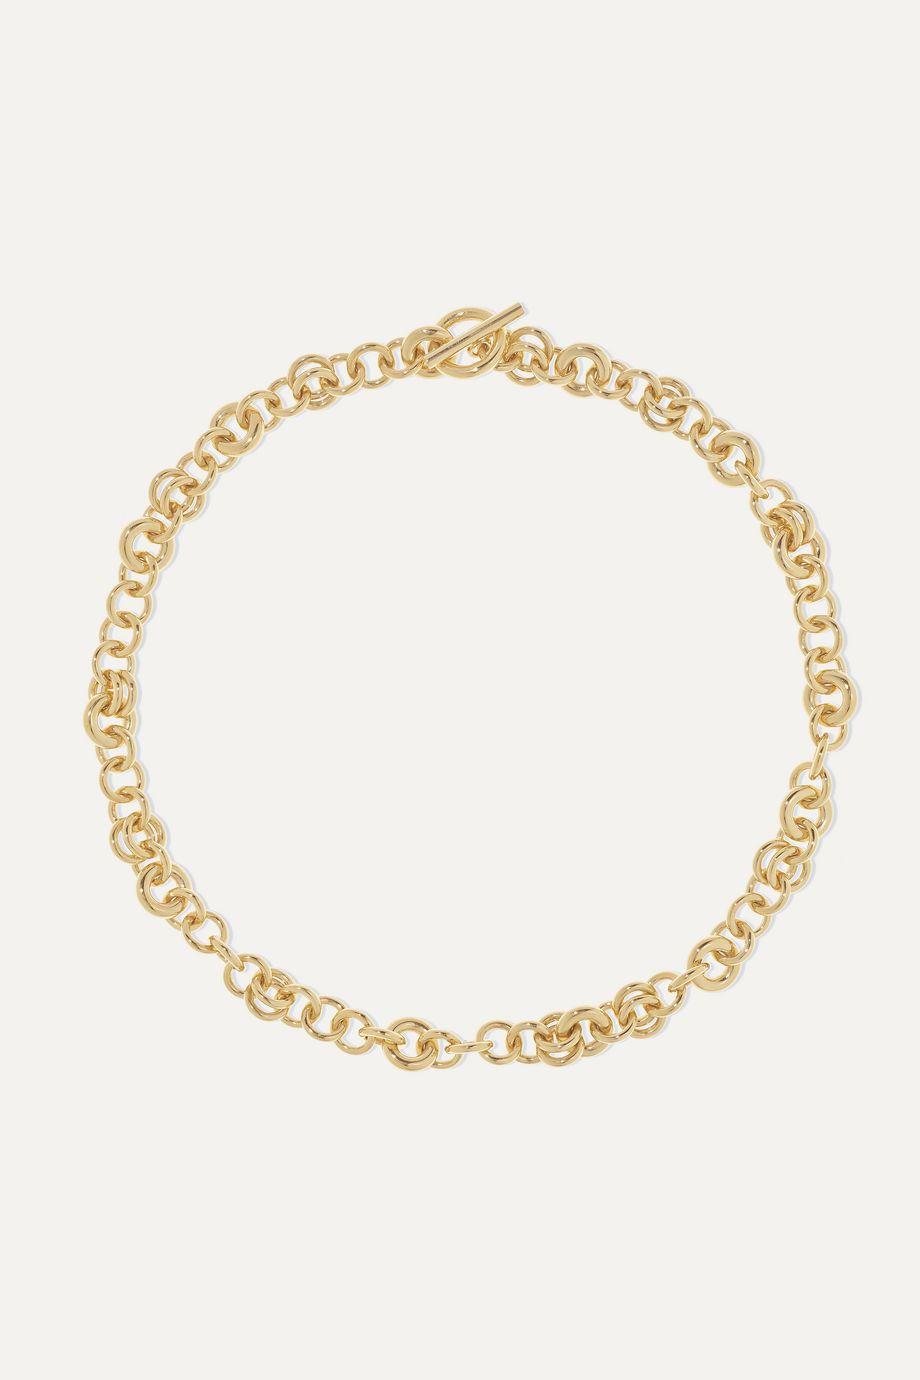 Spinelli Kilcollin Crux 18-karat gold necklace